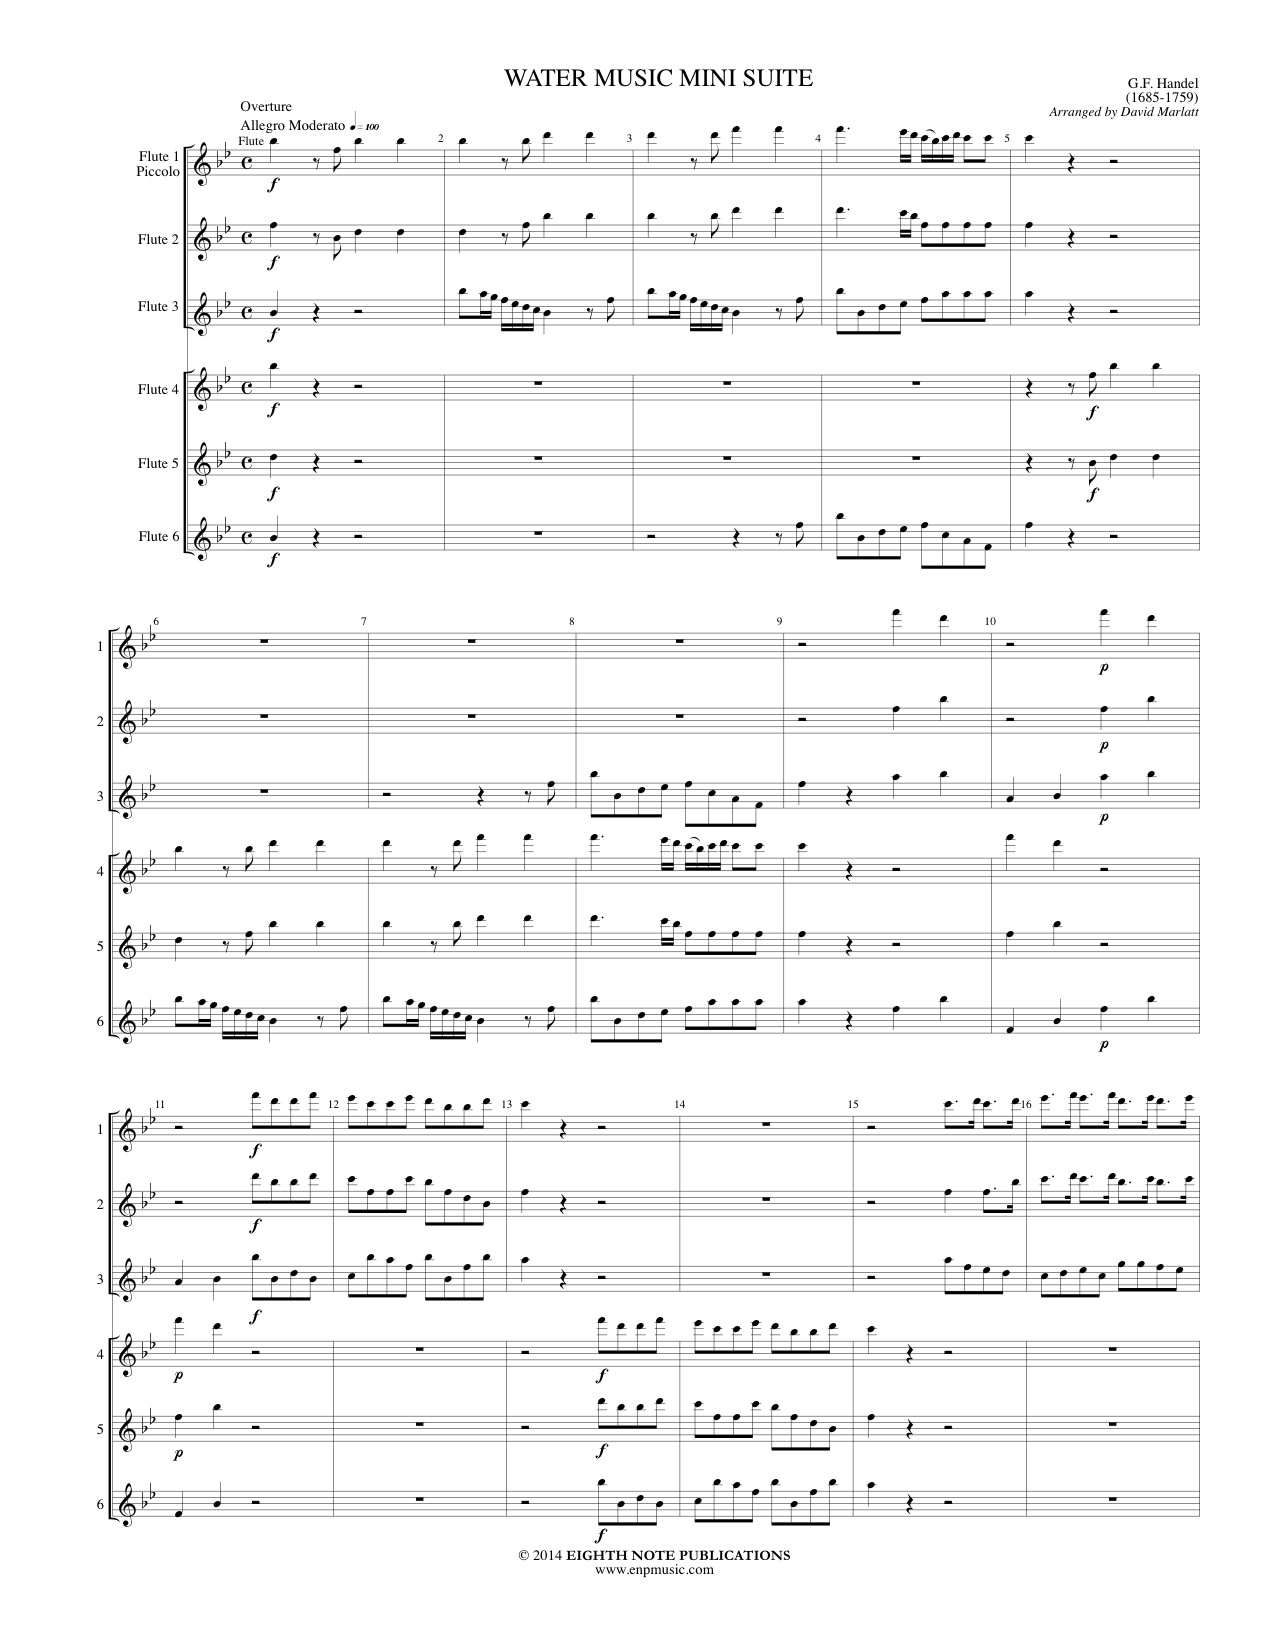 Water Music Mini Suite - George Frederic Handel